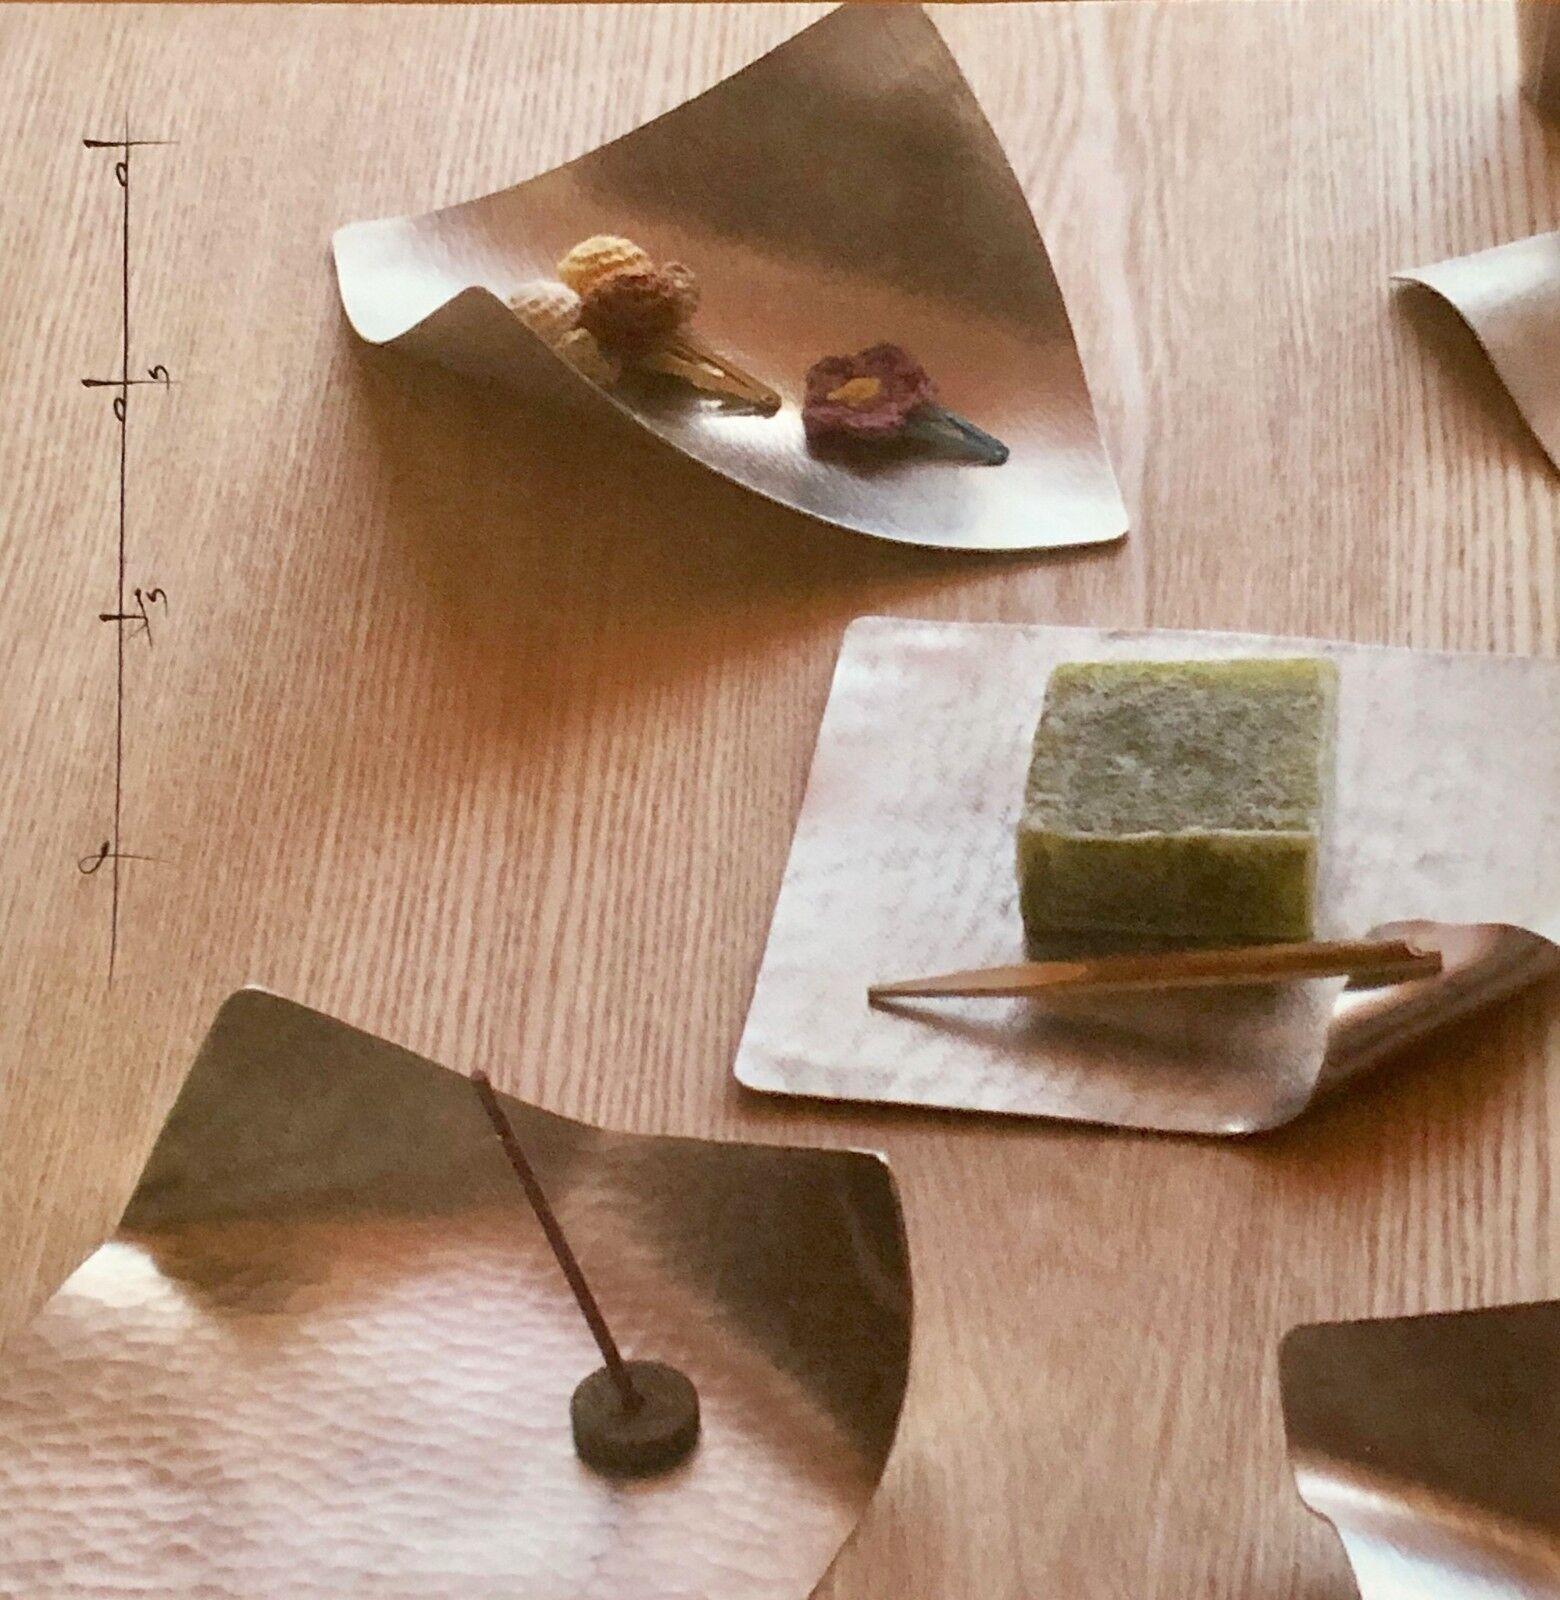 Japanese Fine Flexible Tin Plate Bendable Dish ARARE Handmade in Japan Gift  M